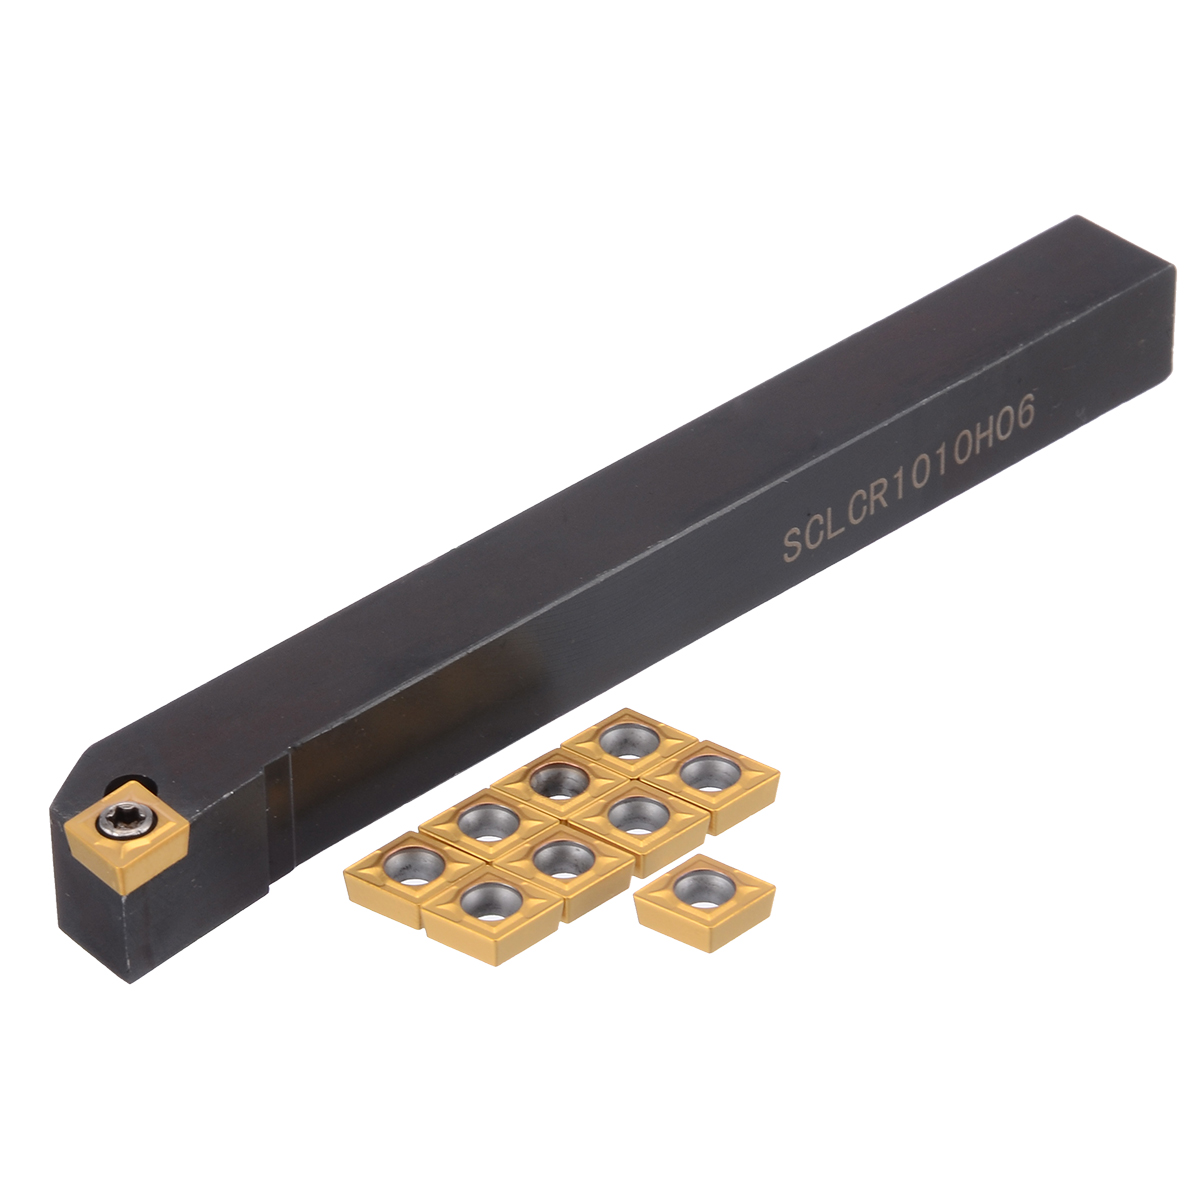 1pc sclcr1010h06 barra chata torno cnc torneamento ferramenta titular + 10 pces ccmt0602 insere 6x6mm lâminas com chave para usinagem